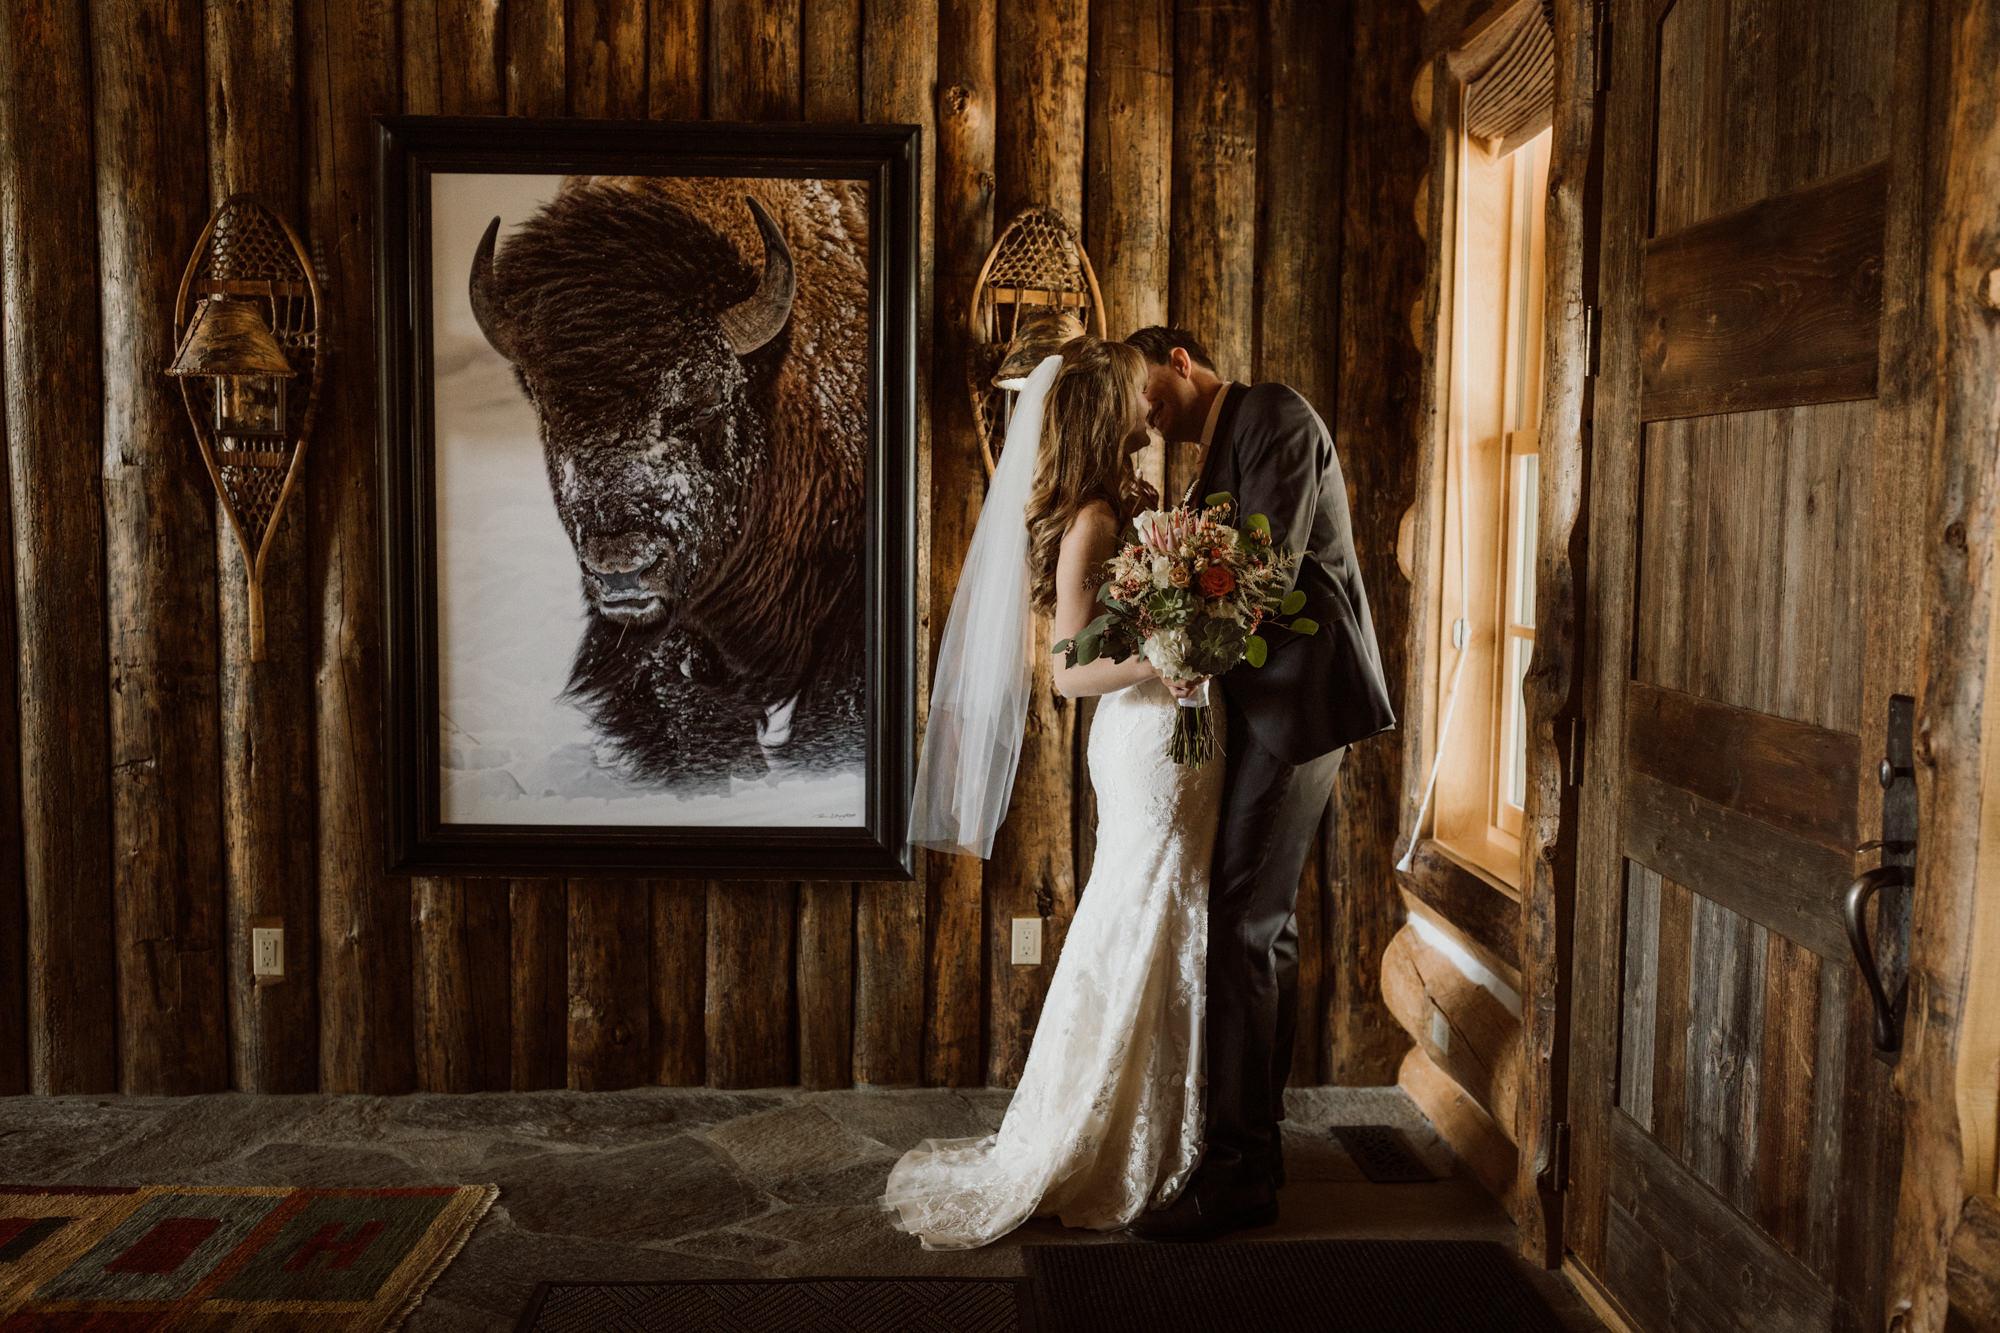 grand-teton-national-park-wedding-25.jpg